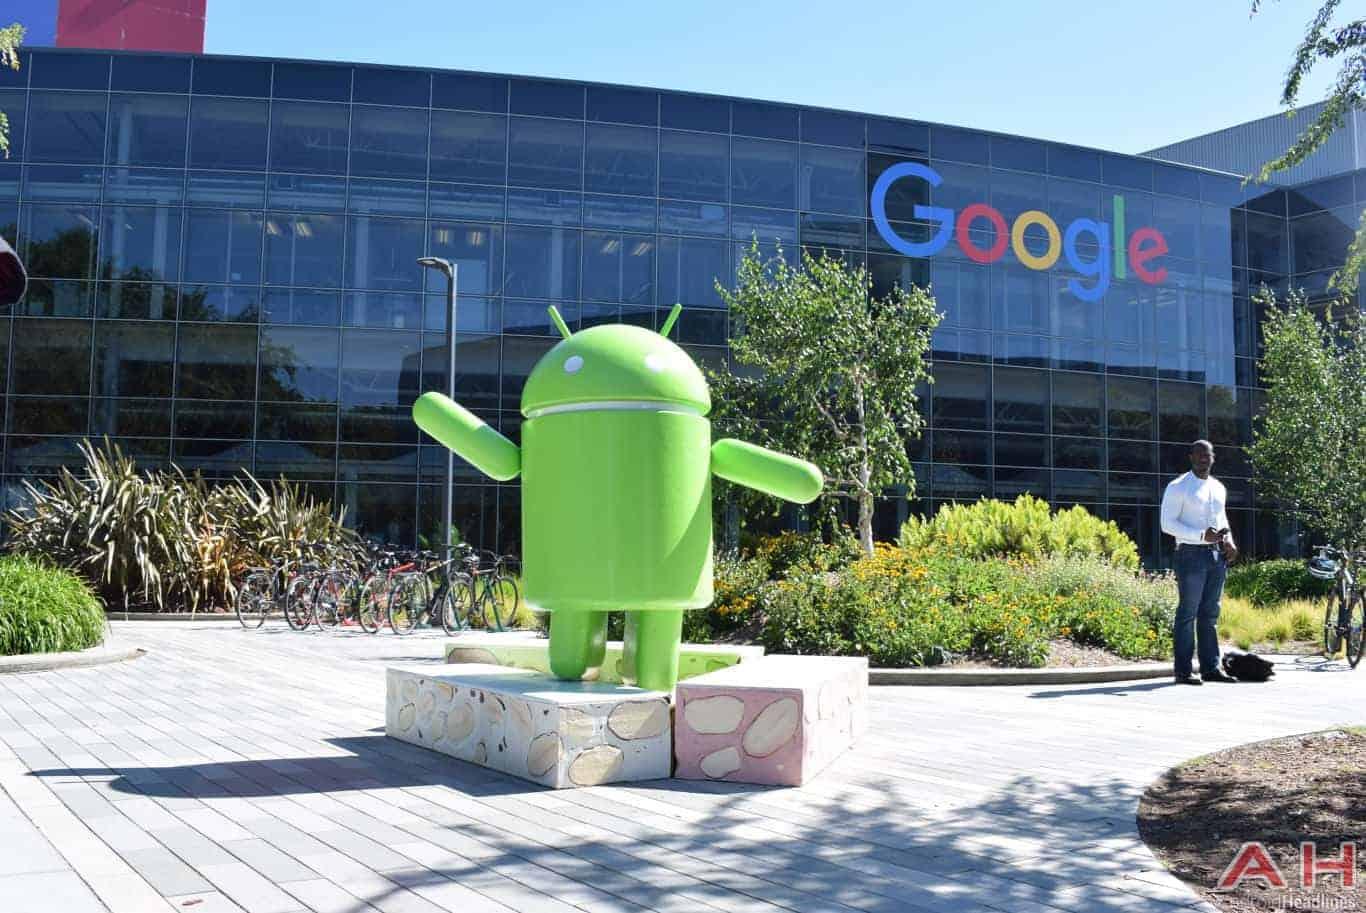 Googleplex Android Statue Google AH 18